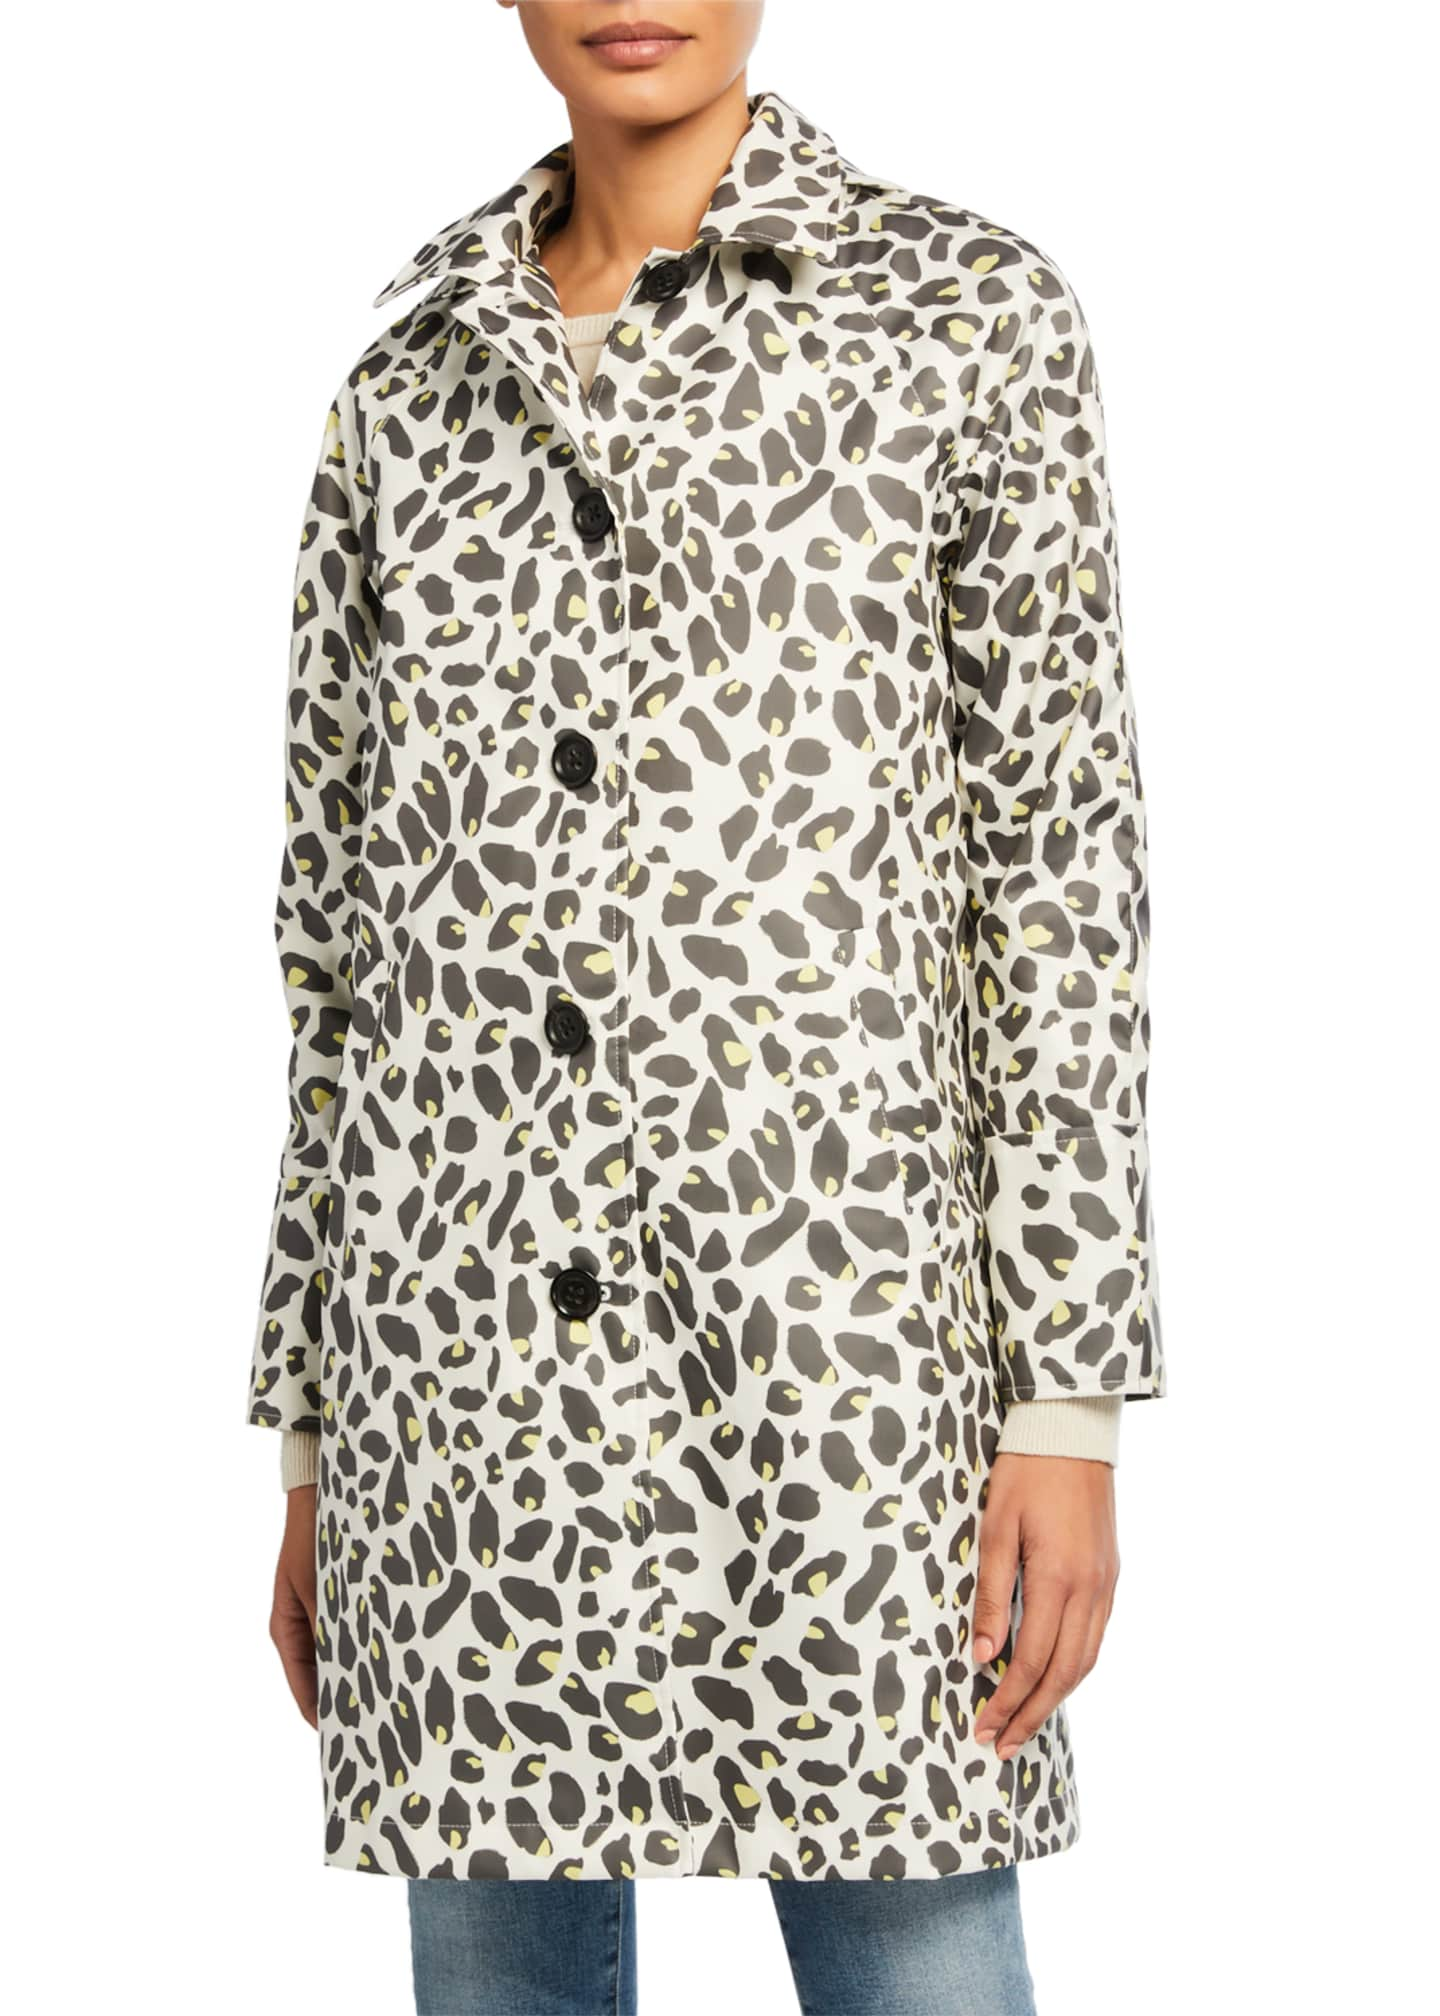 Jane Post Leopard-Print Button-Up Slicker